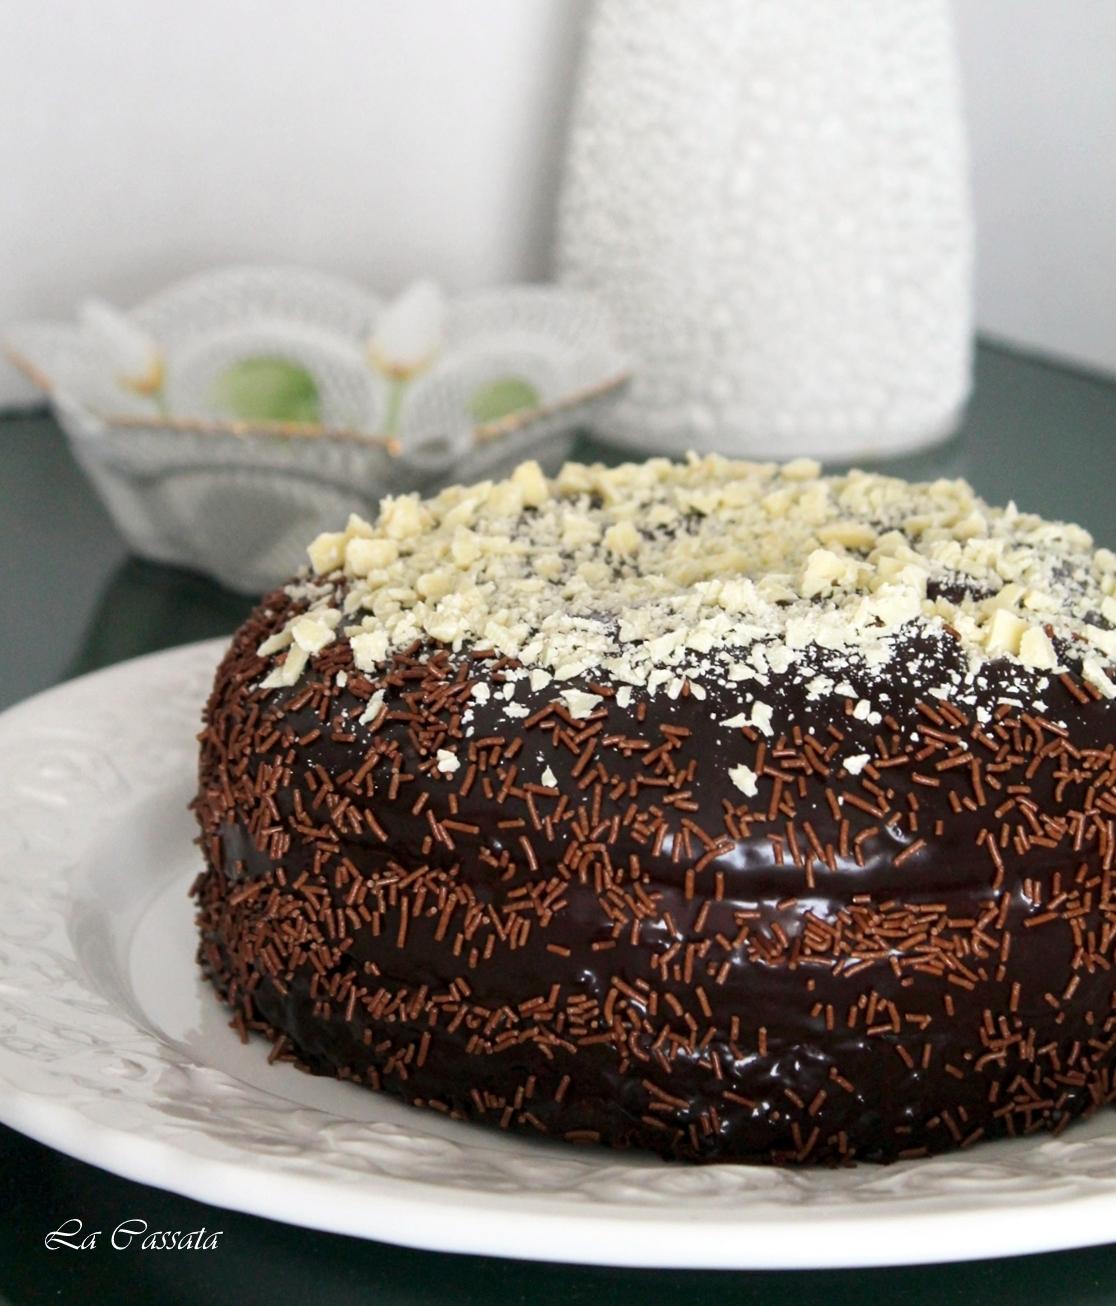 Tarte au chocolat avec cr me de mascarpone et caramel mou m me sans gluten la cassata - Tarte au chocolat sans oeuf ...